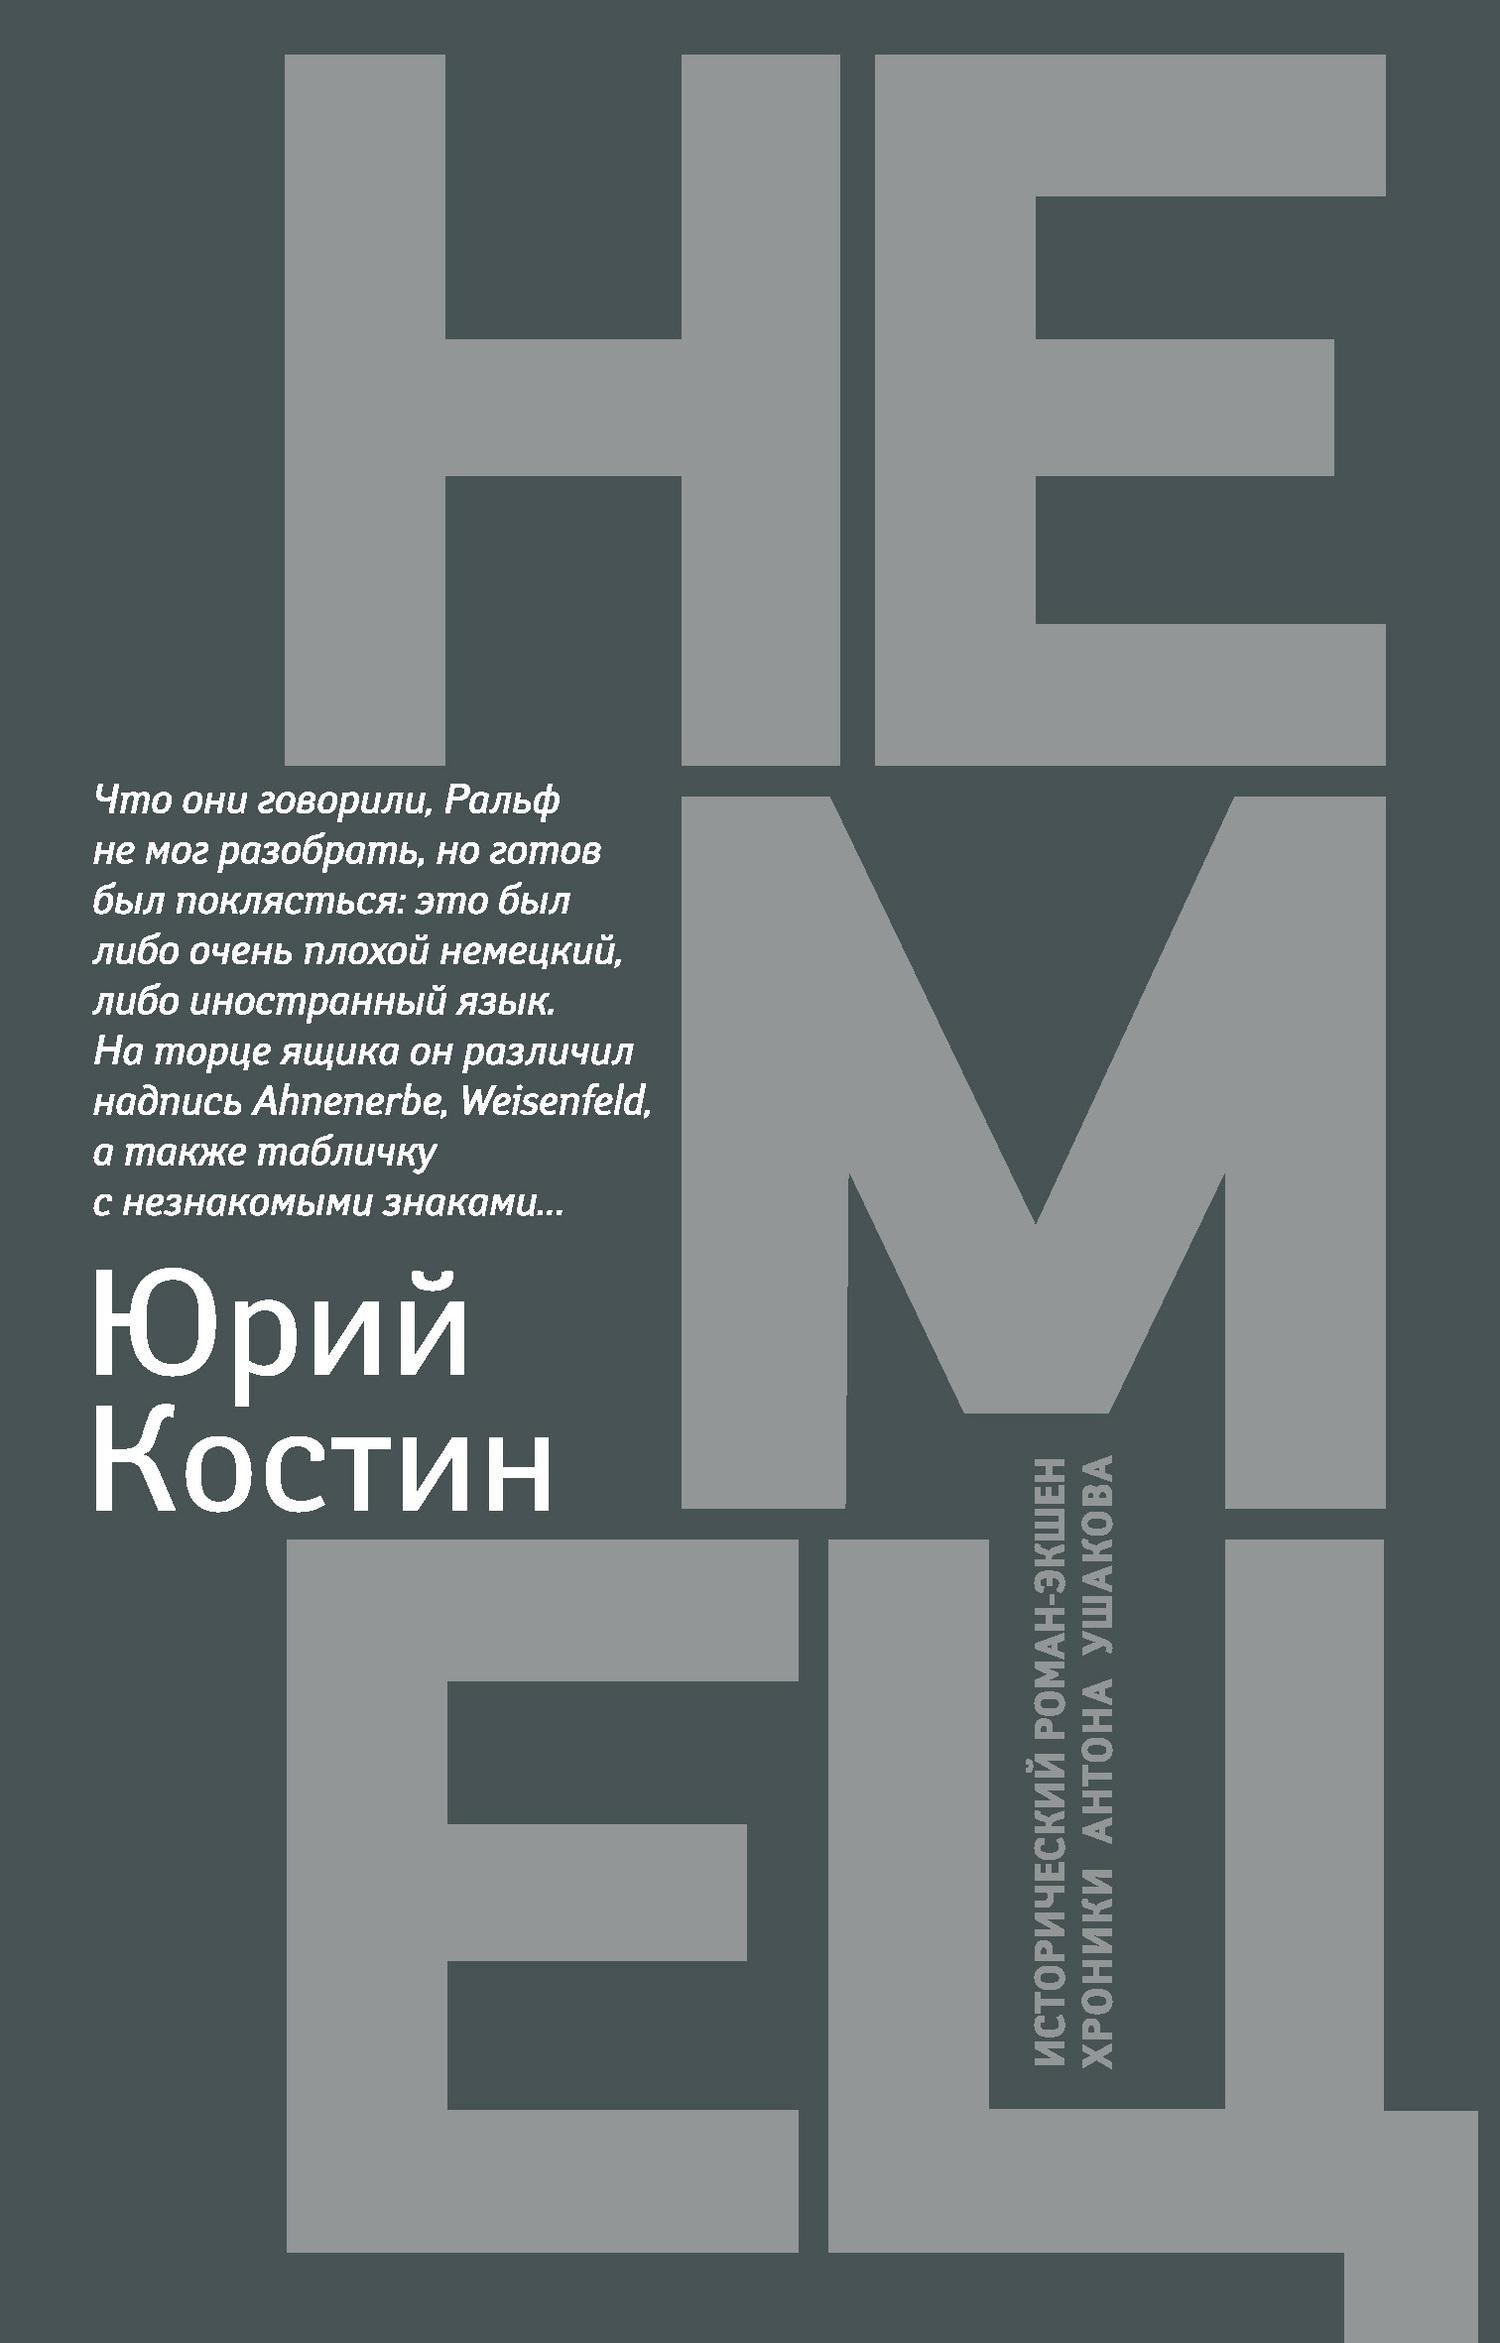 Юрий Костин - Немец